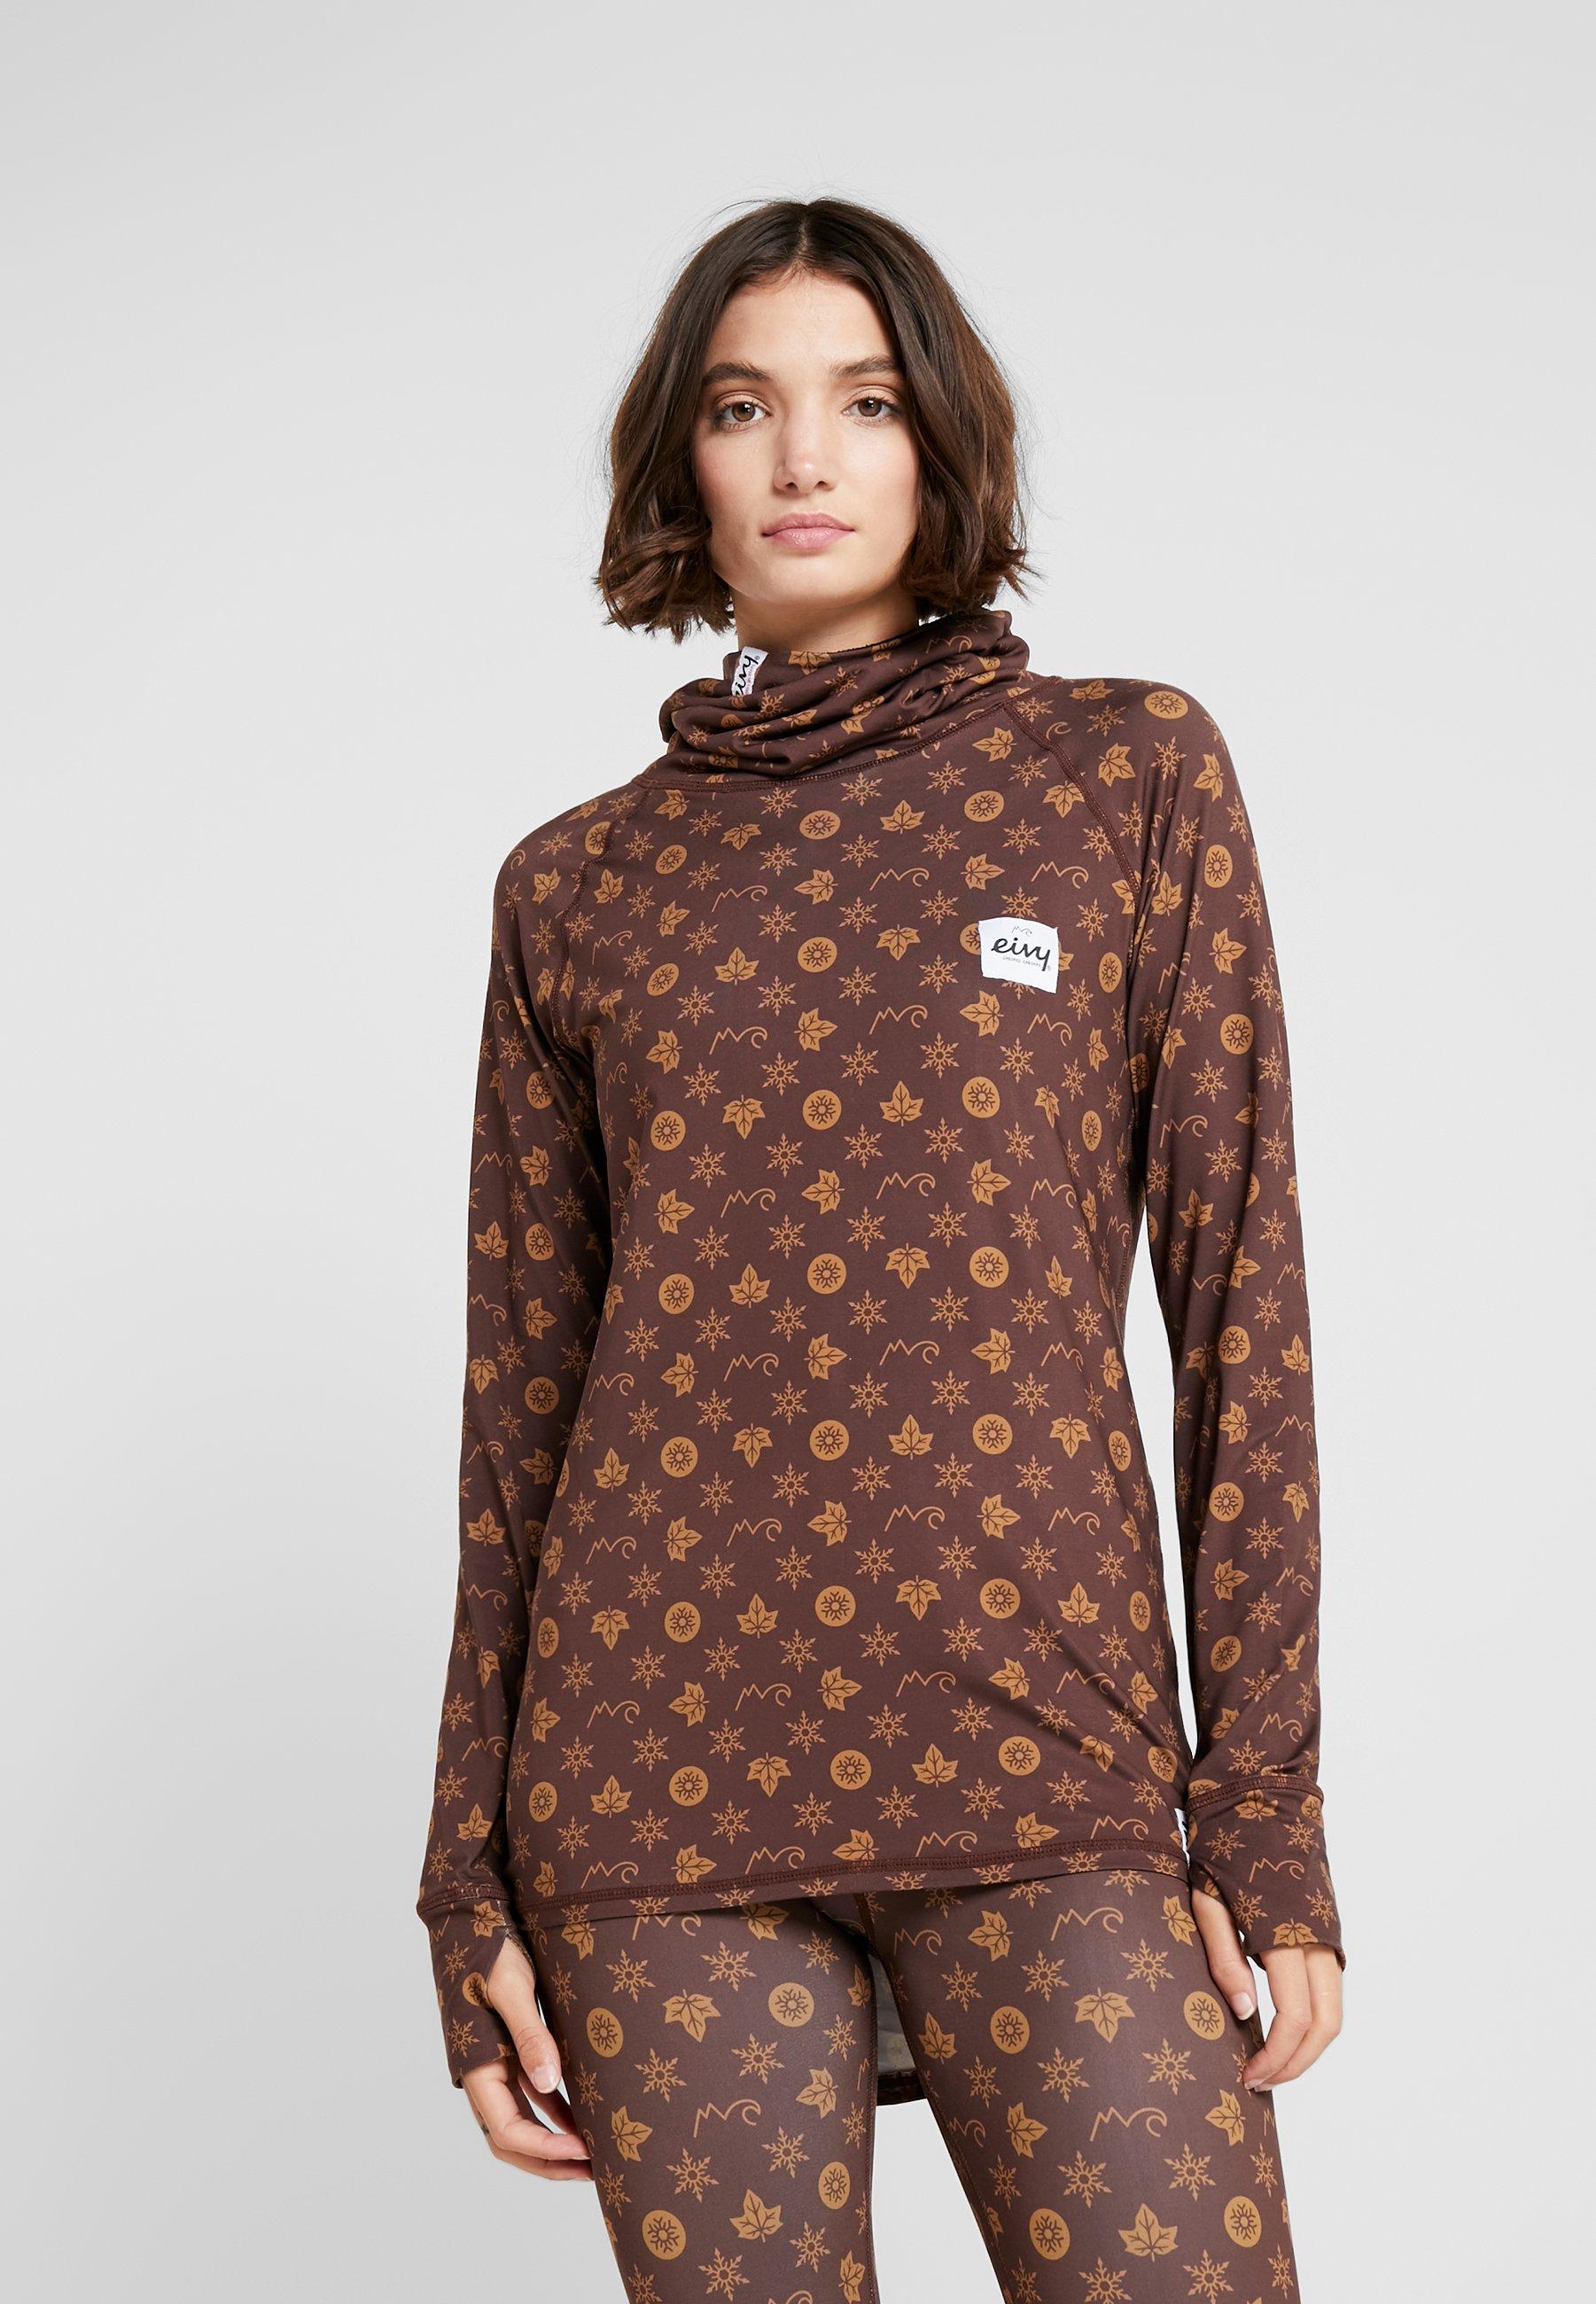 Monogram Eivy GaiterT Sportiva Icecold shirt 35jqAc4RL